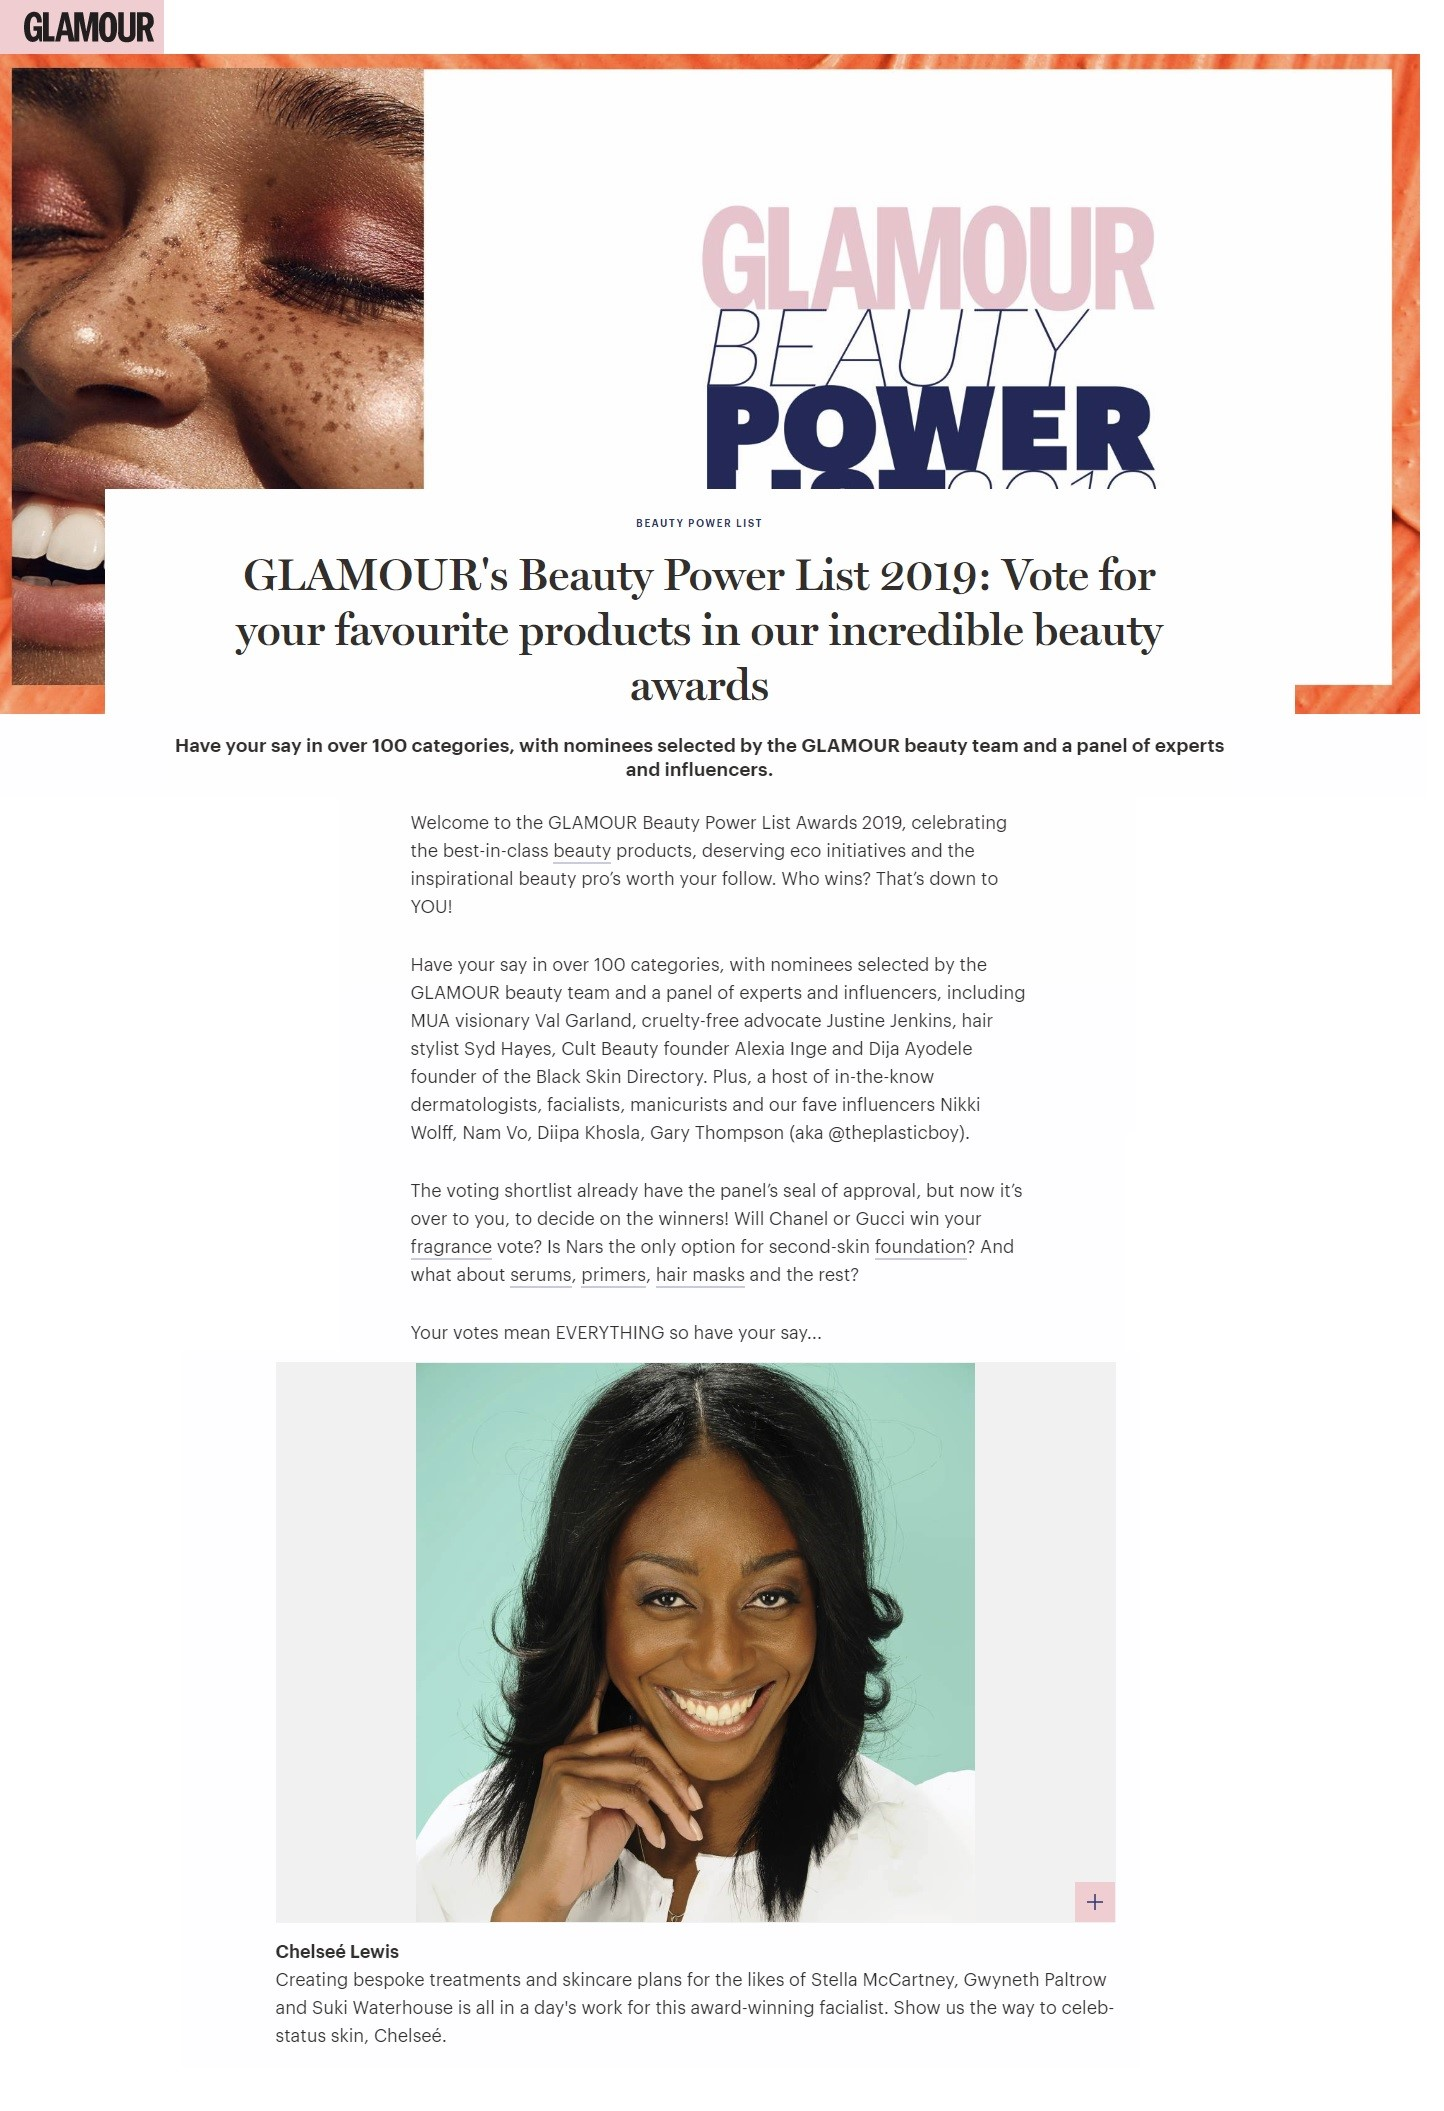 Glamour Beauty Power List